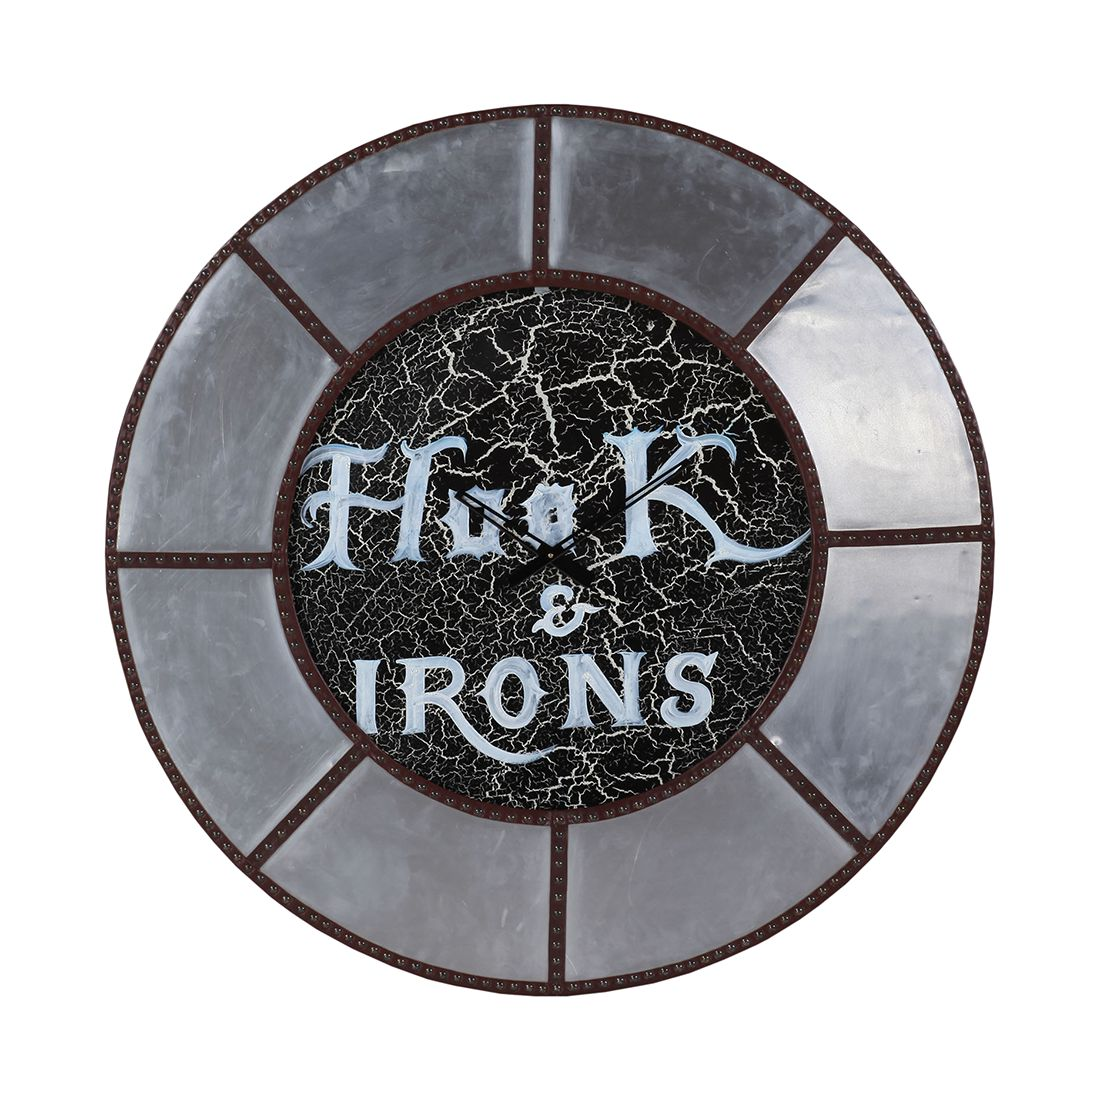 home24 Wanduhr Portilla | Dekoration > Uhren > Wanduhren | Silber | Holzwerkstoff | ars manufacti